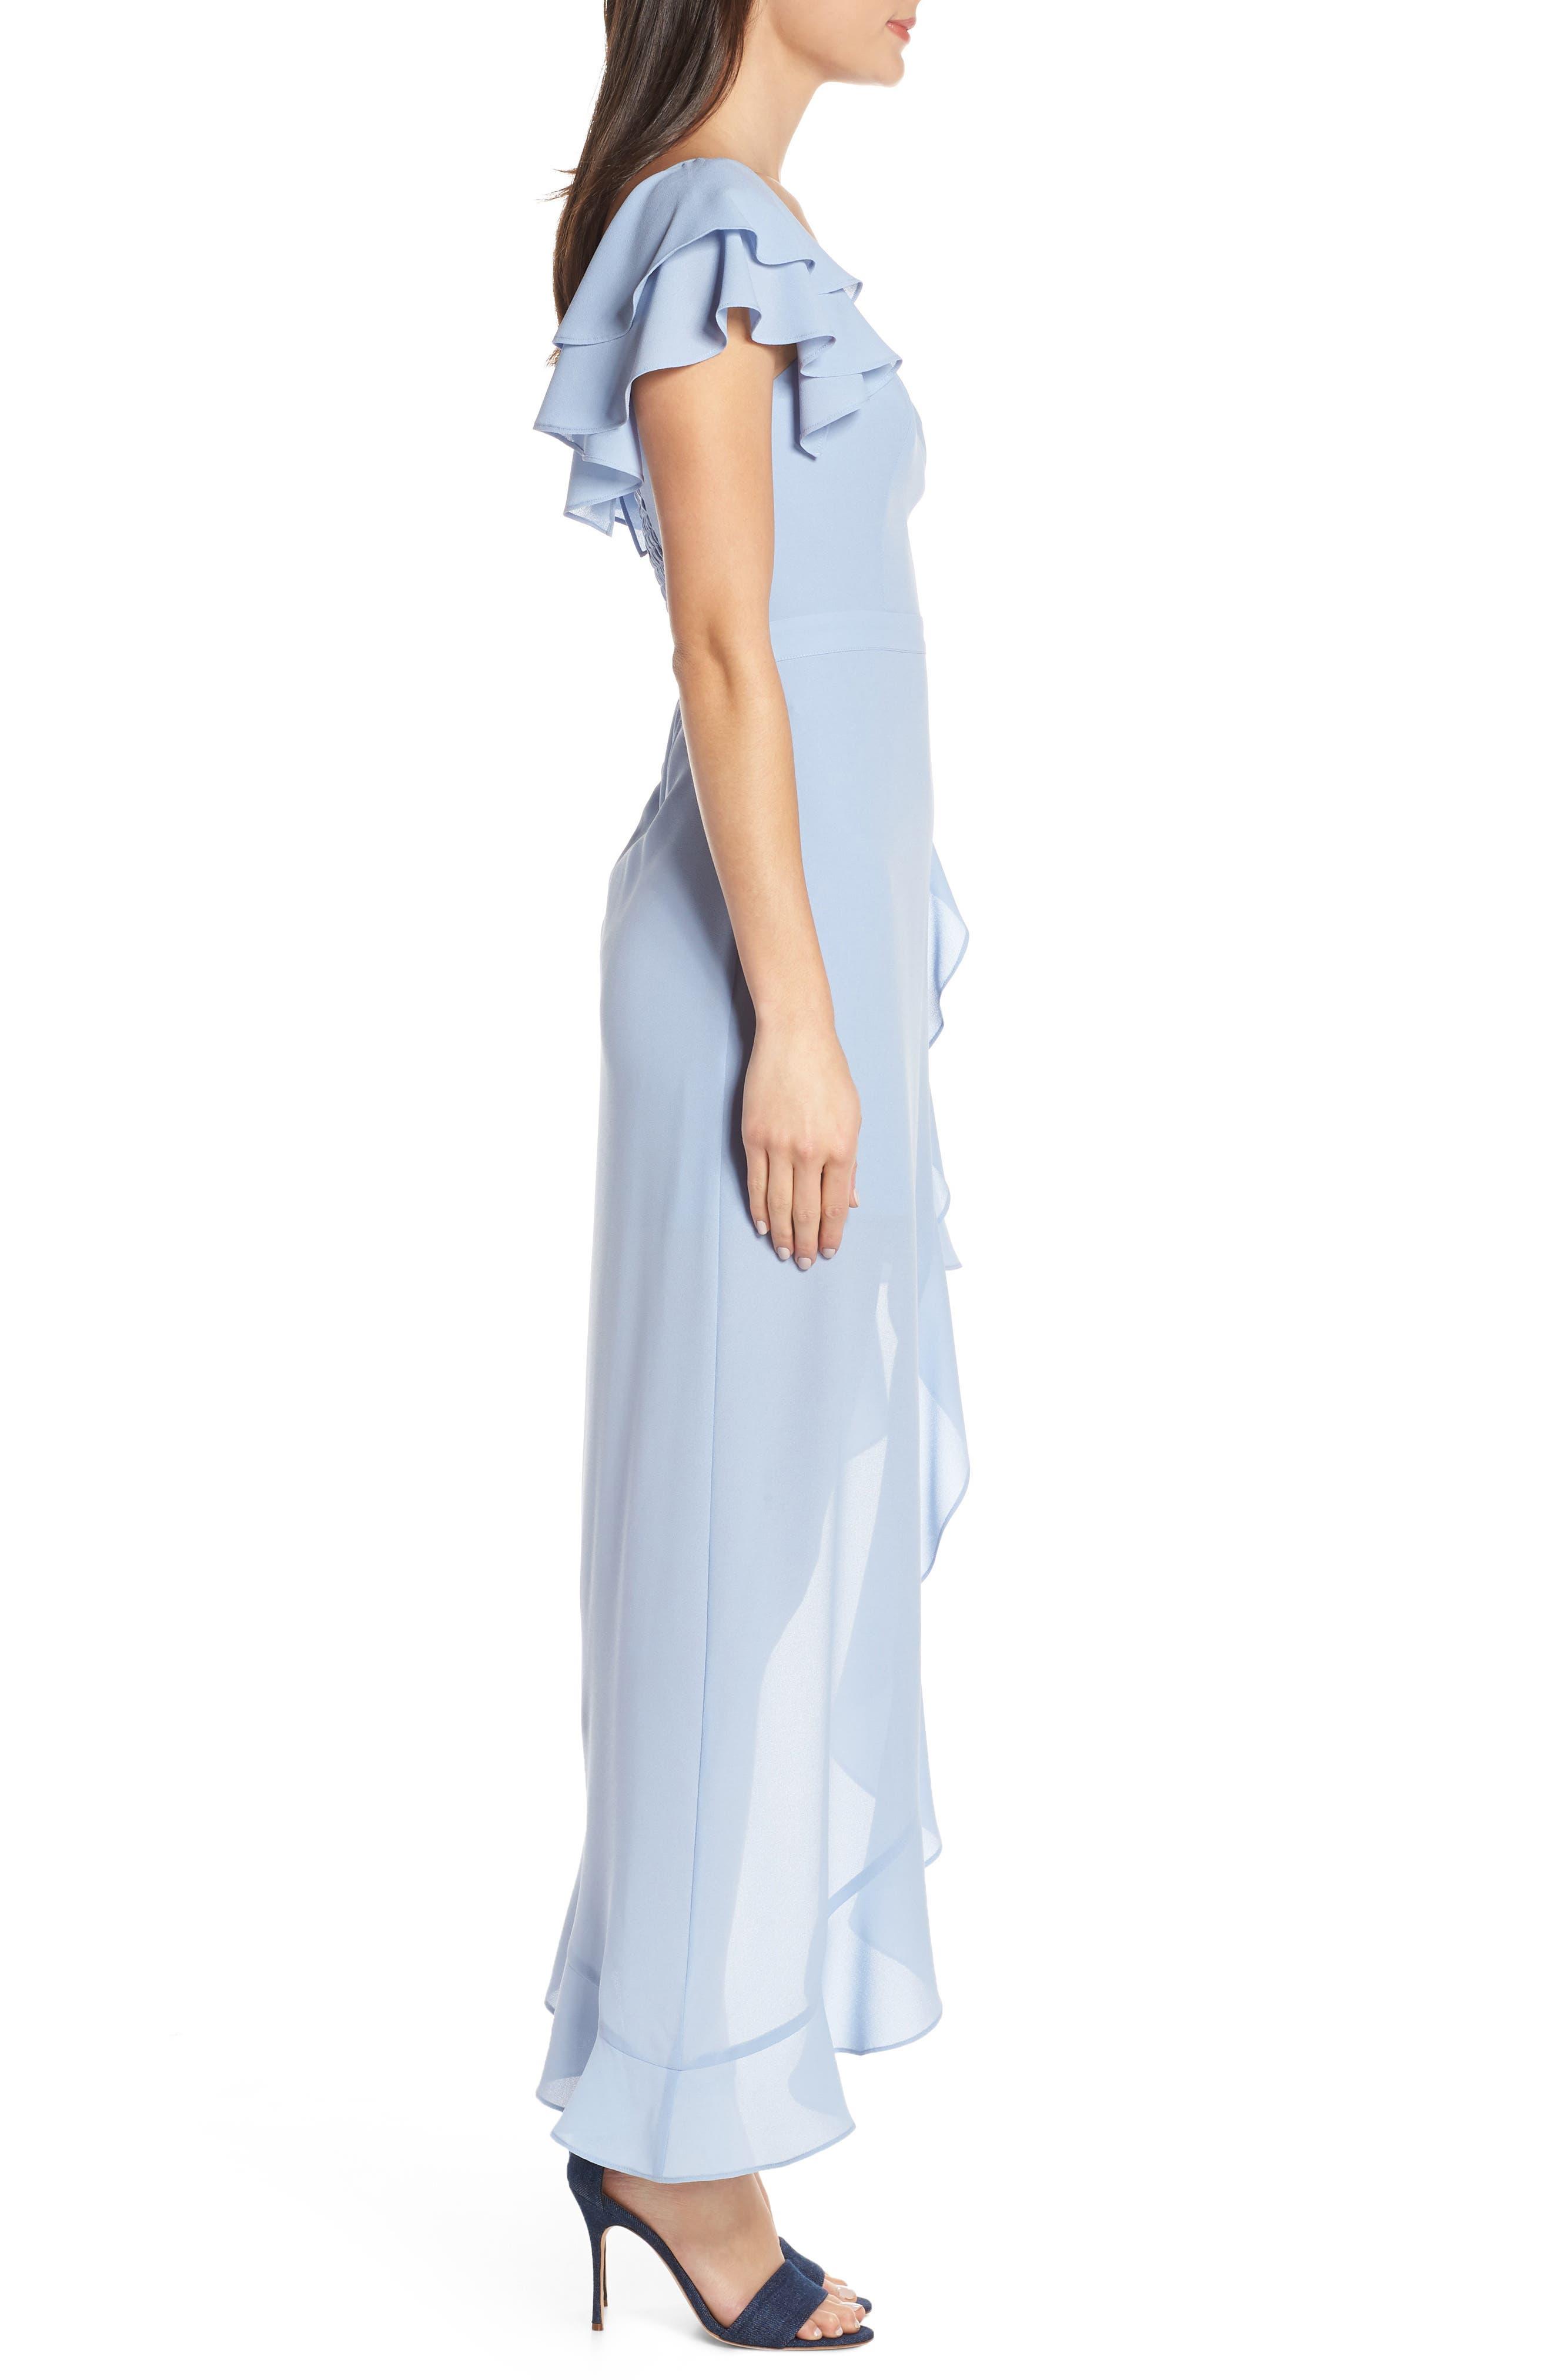 ALI & JAY, Terrace Time Asymmetrical Maxi Dress, Alternate thumbnail 4, color, 400